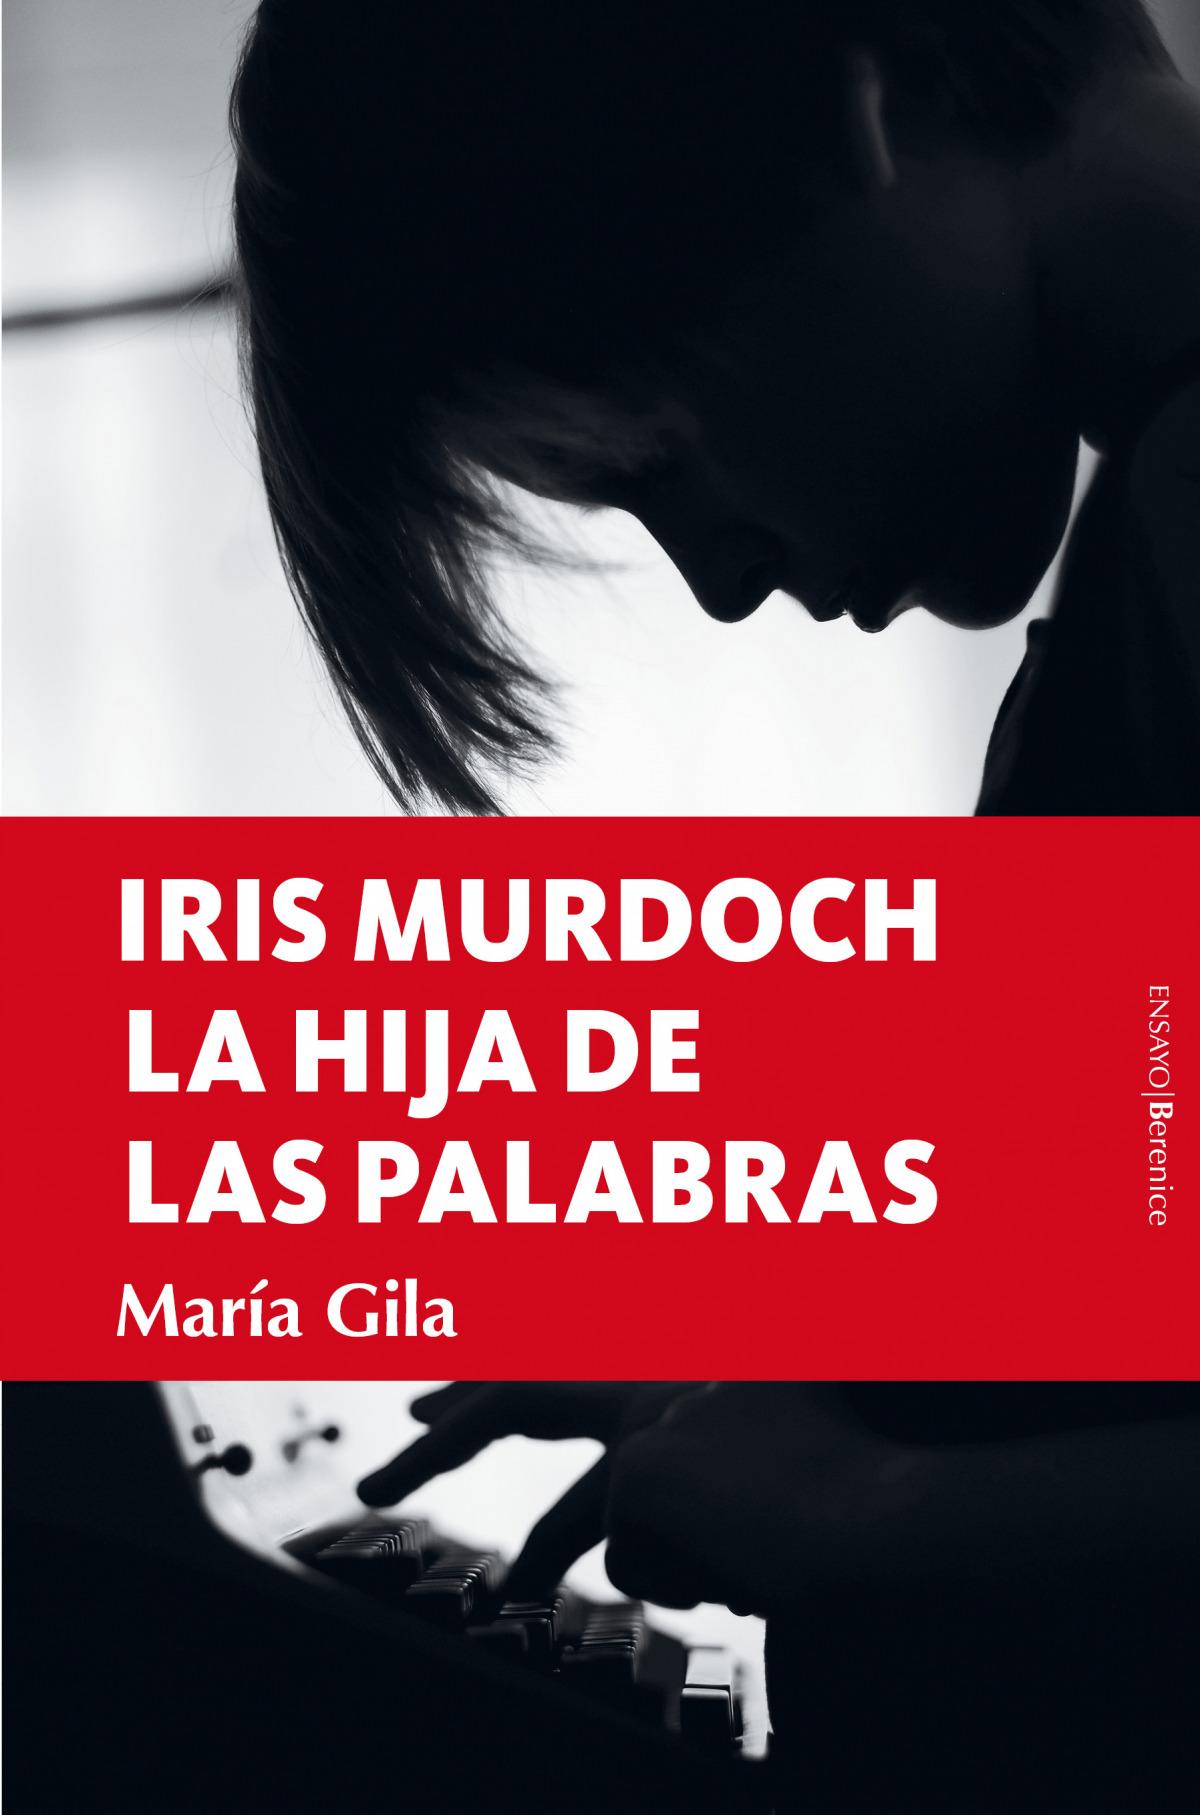 Iris Murdoch, la hija de las palabras